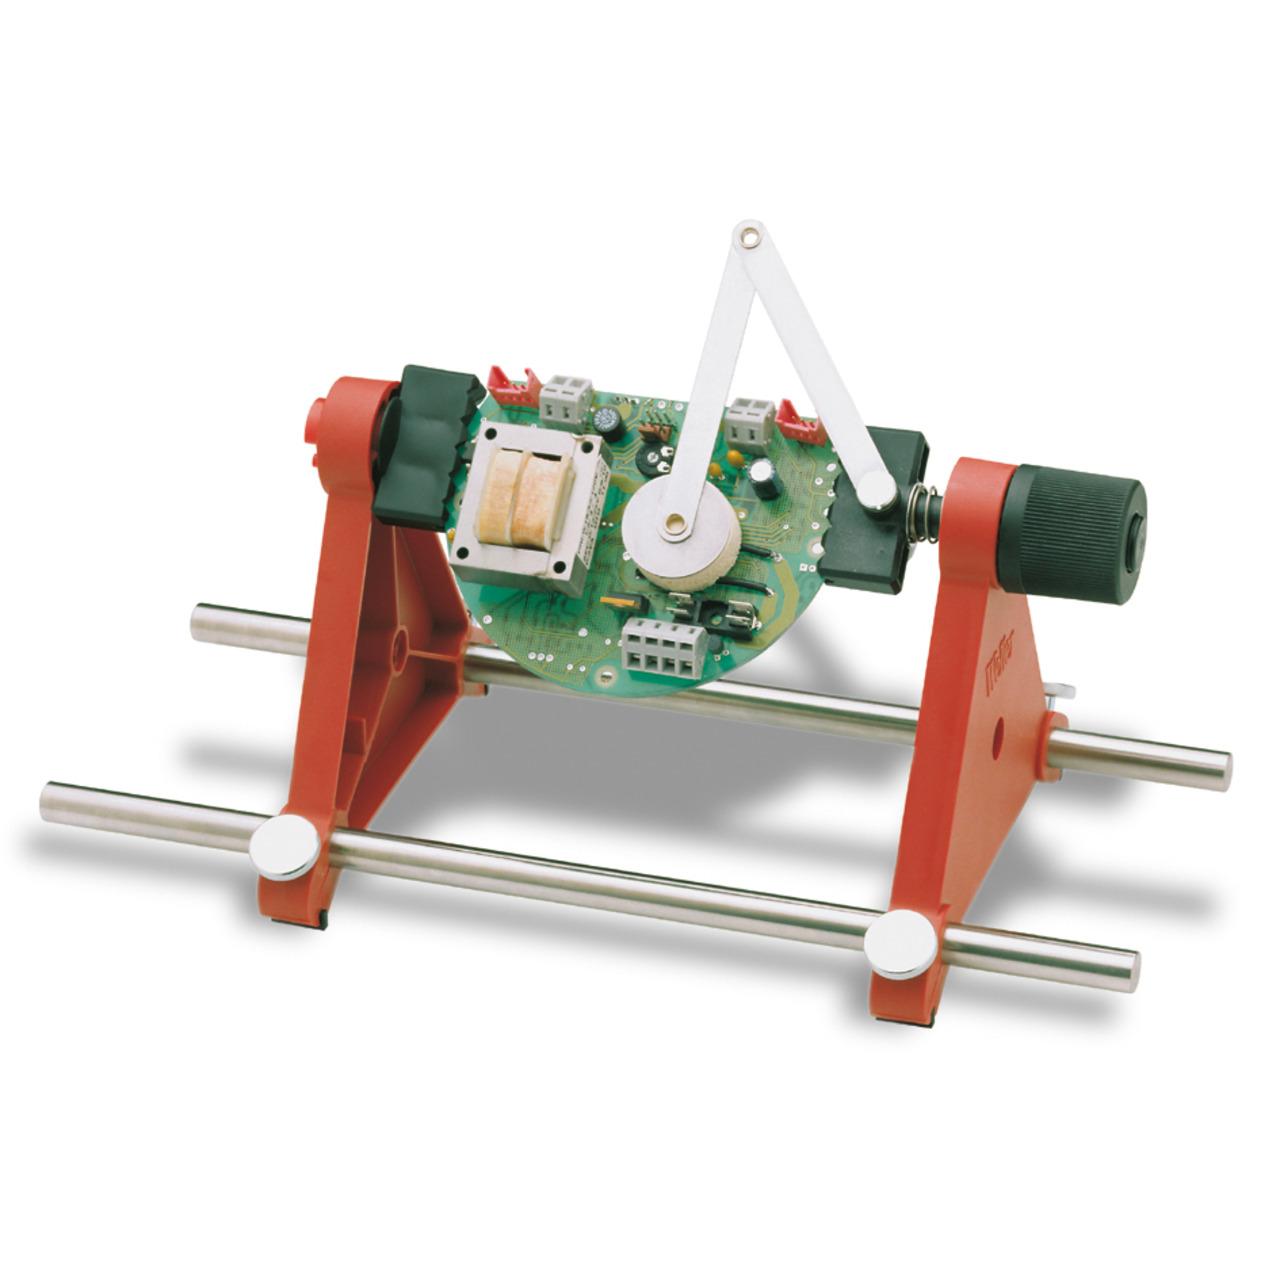 Weller Euro Solder Fix 120 Platinenhalter- 360- schwenkbar